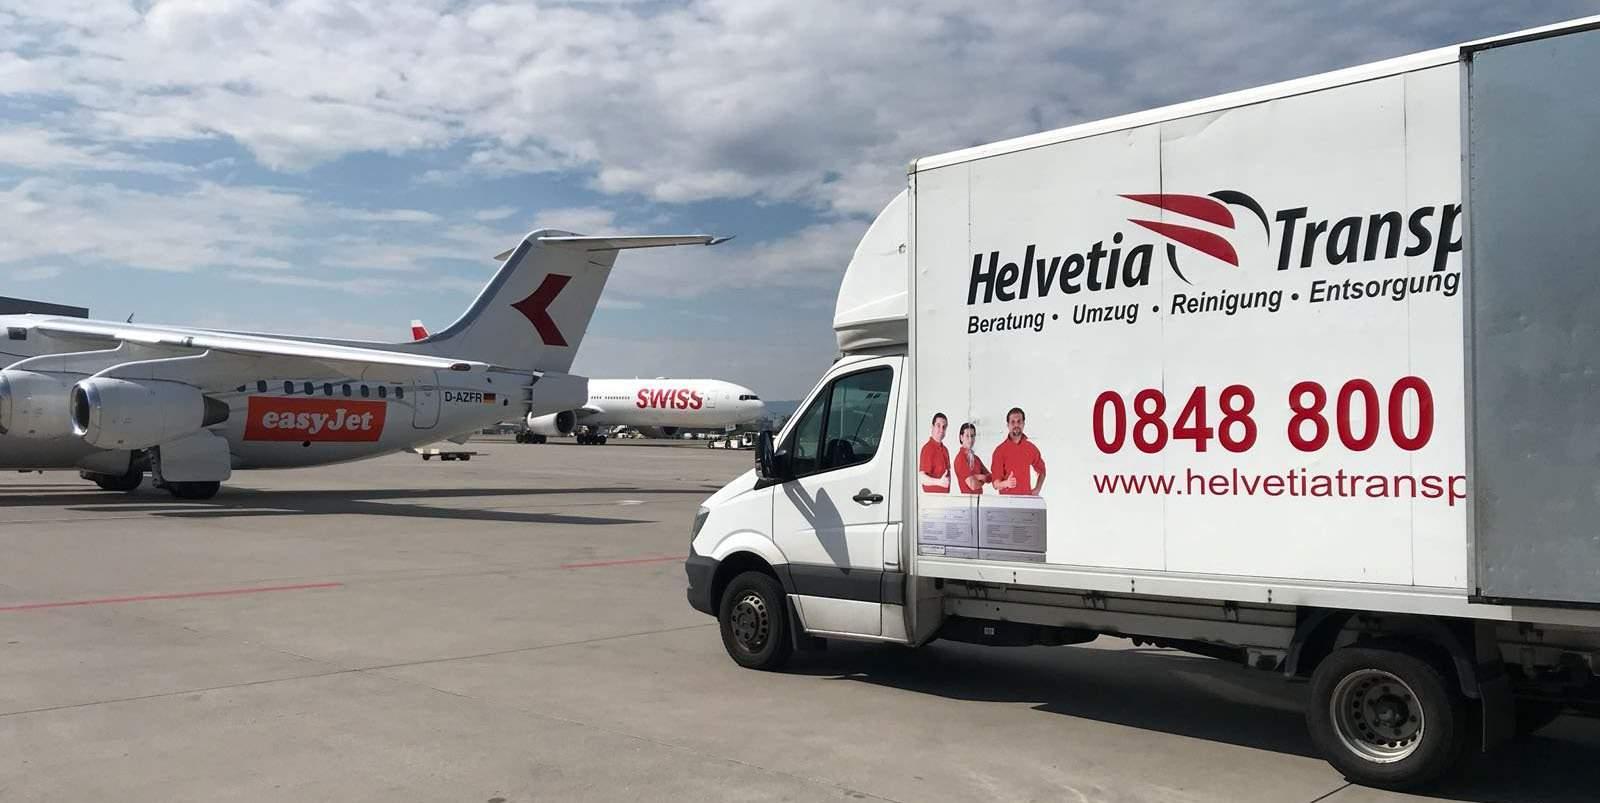 HelvetiaTransporte Auslandumzug